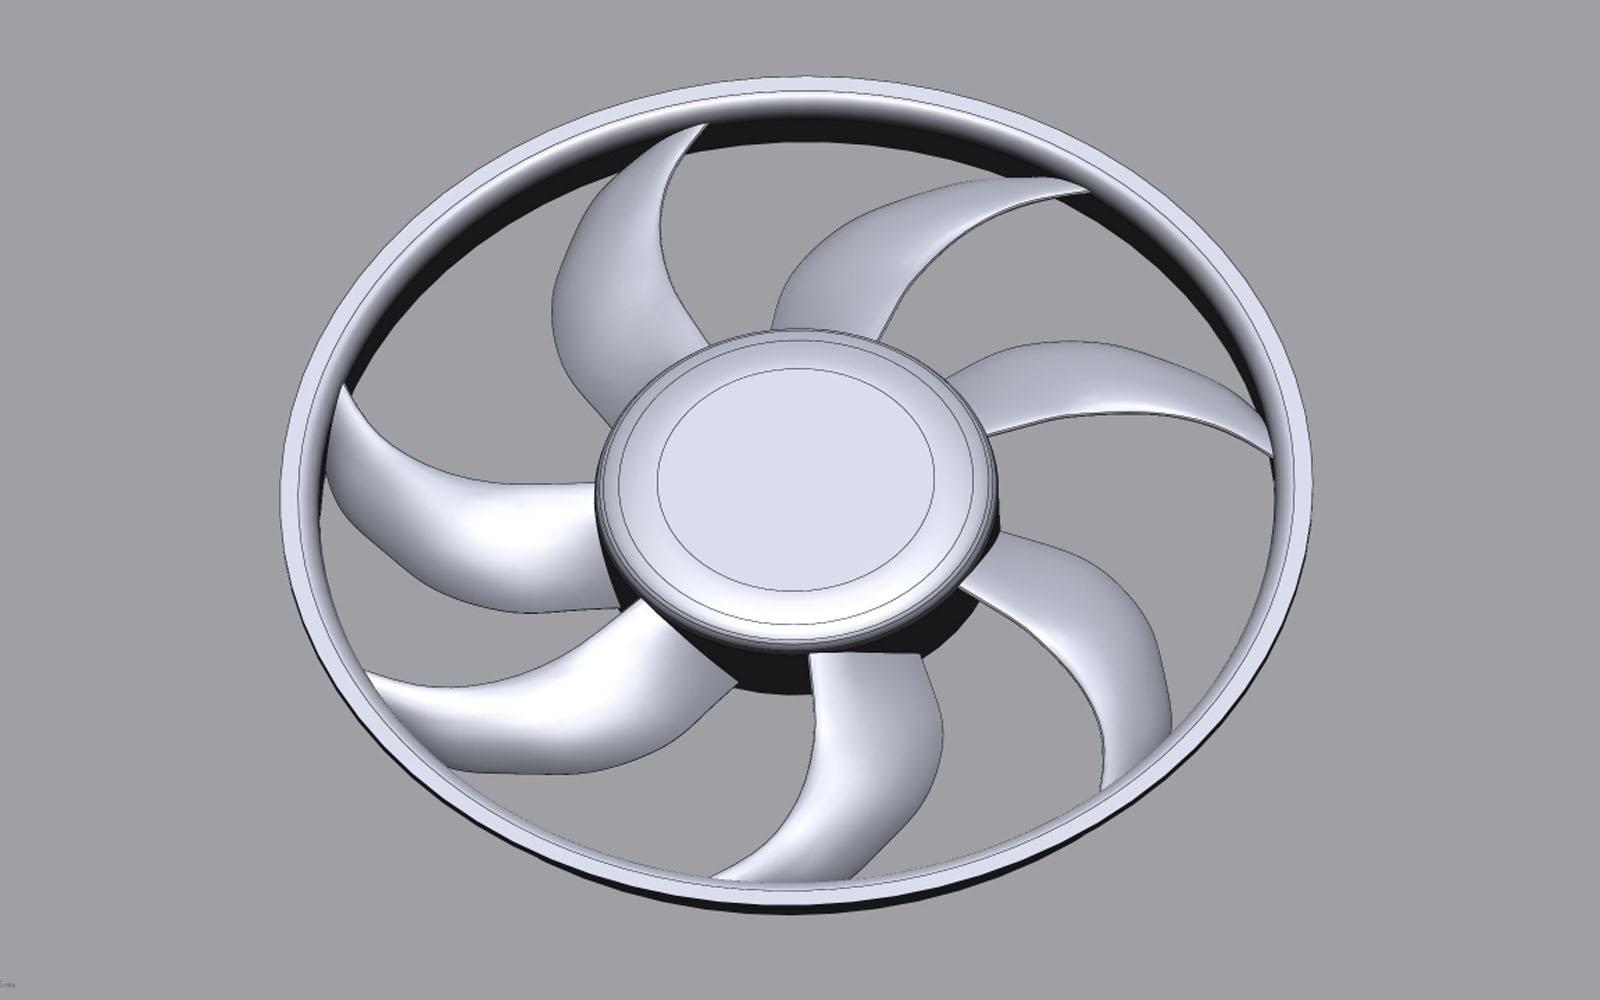 Conap 3D Reverse Engineering - Polygonflächenmodell eines Lüfterrades